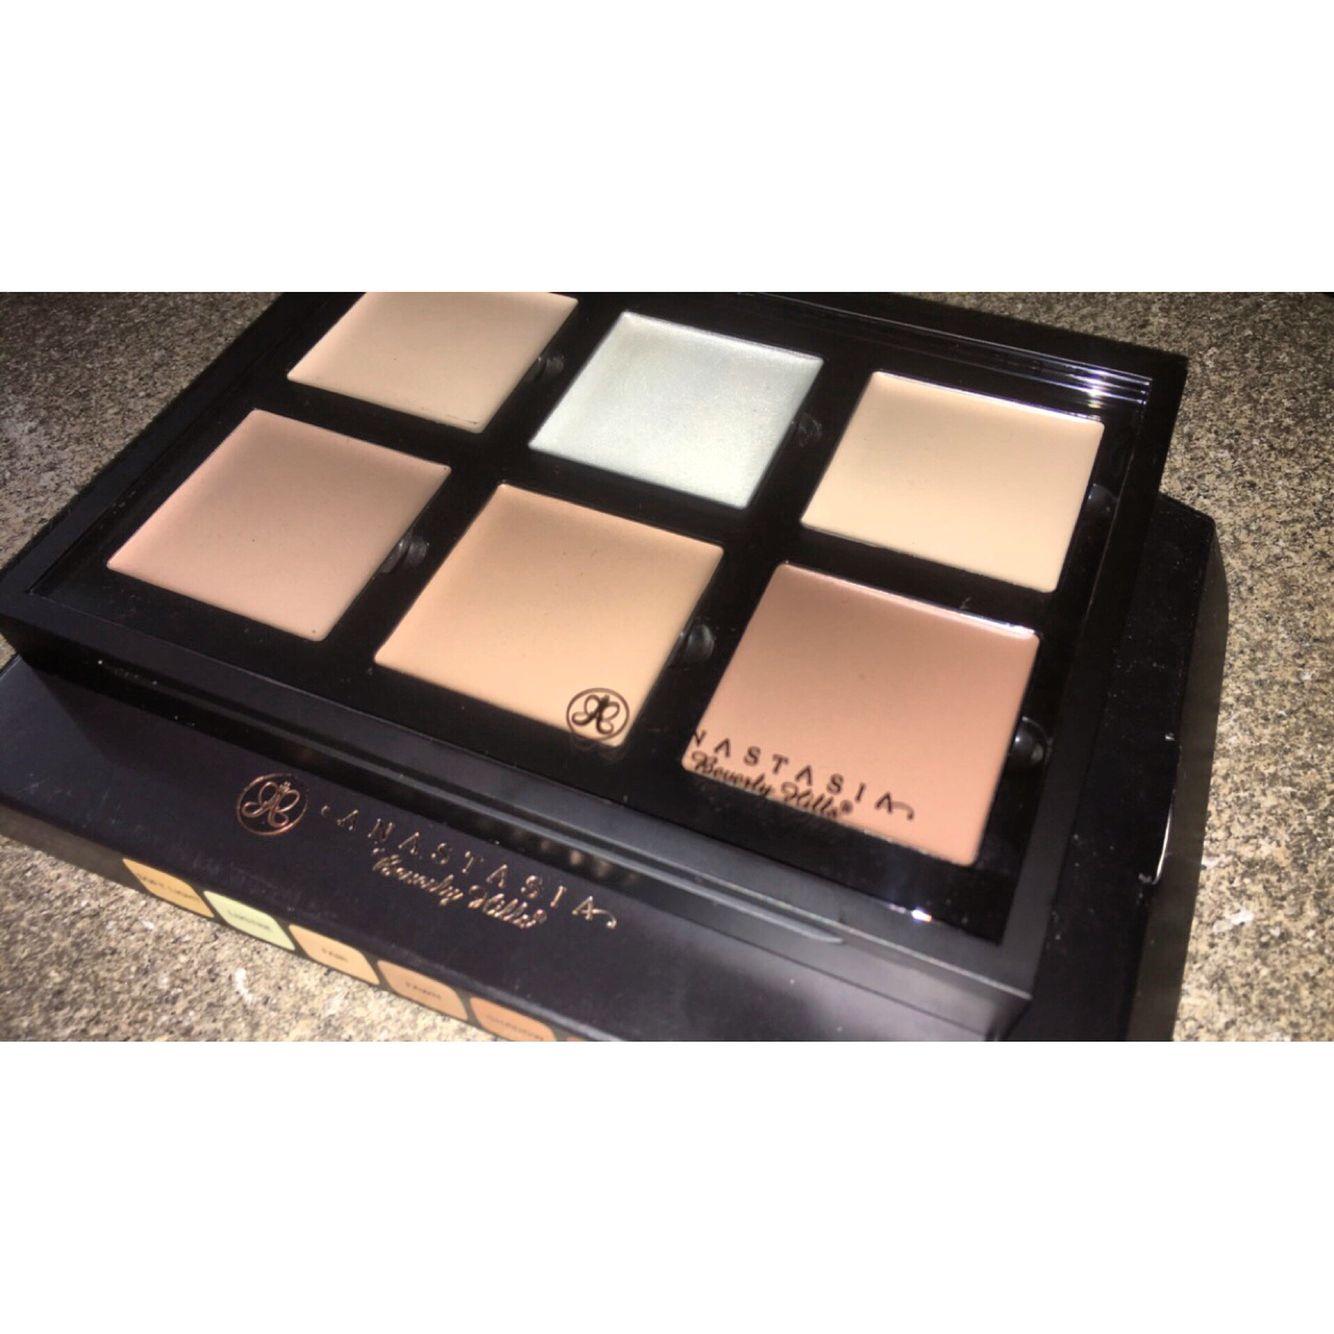 Anastasia Beverly Hills cream contour kit ❤️